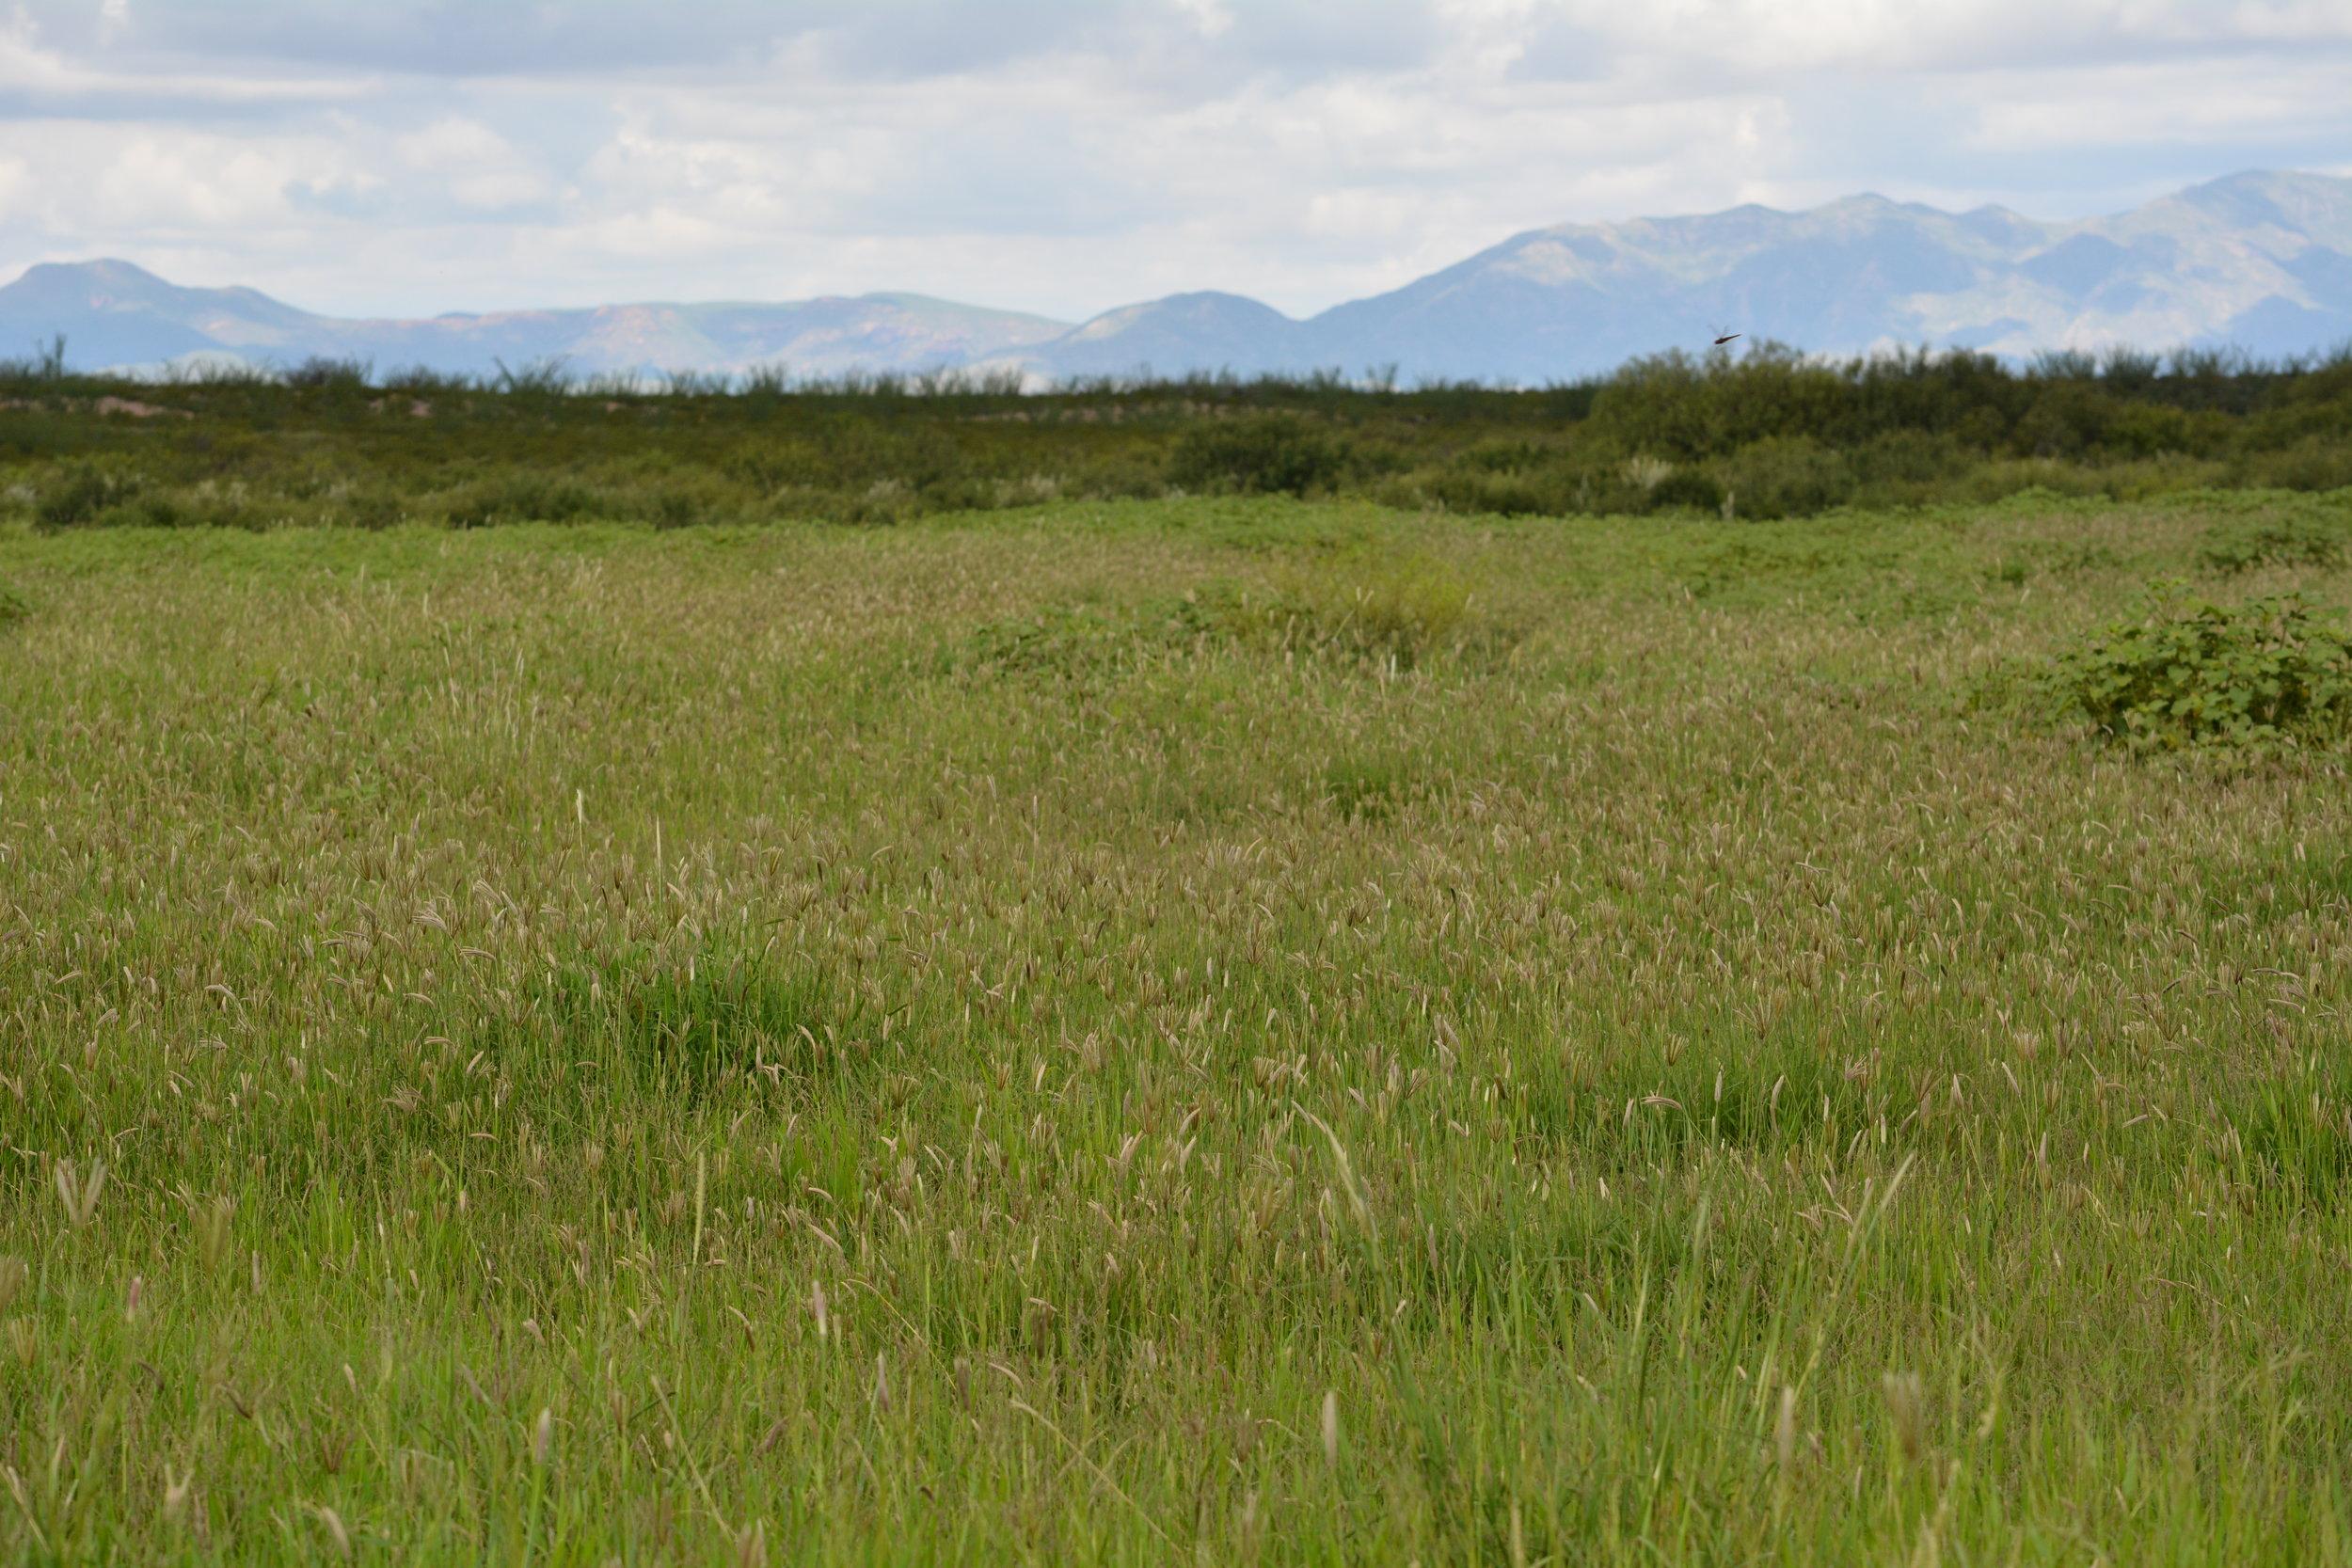 Healthy grasslands establishing